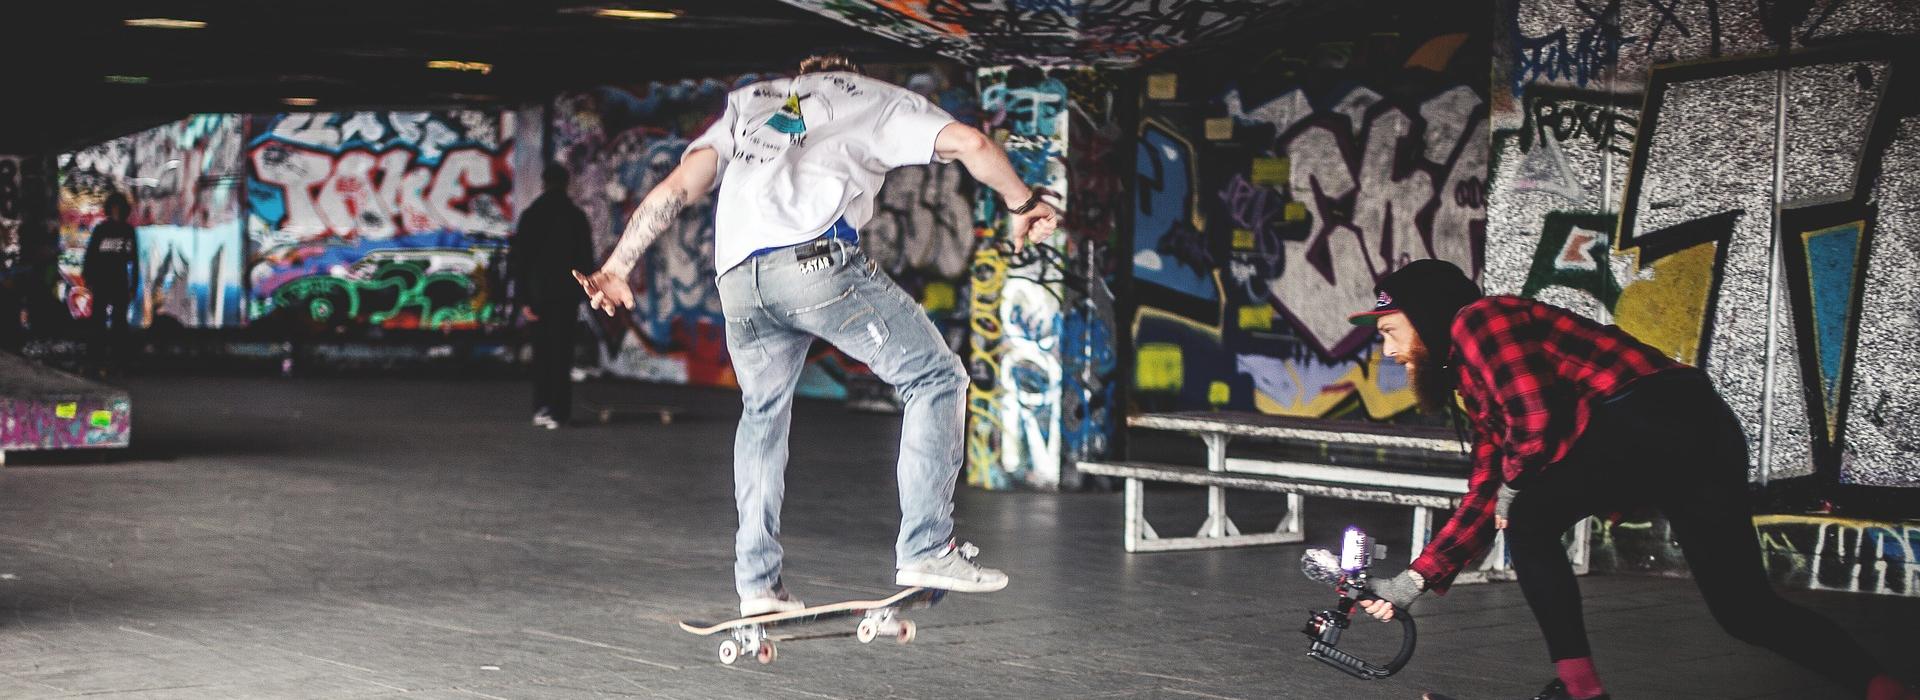 graffitiartexamples